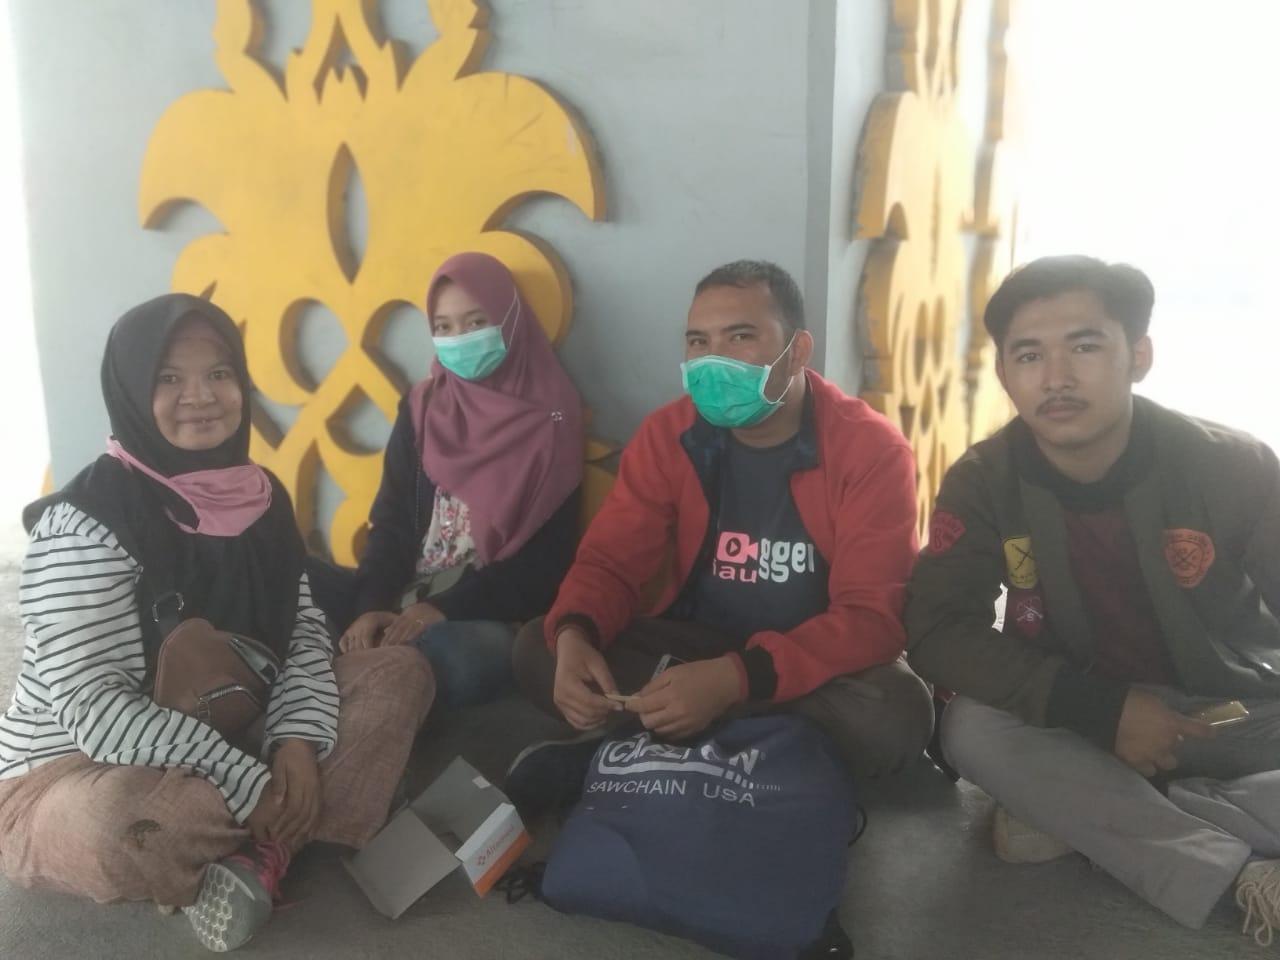 Kabut Asap Pekanbaru Makin Tebal, Para Conten Creator Bagikan 1000-an Masker Gratis